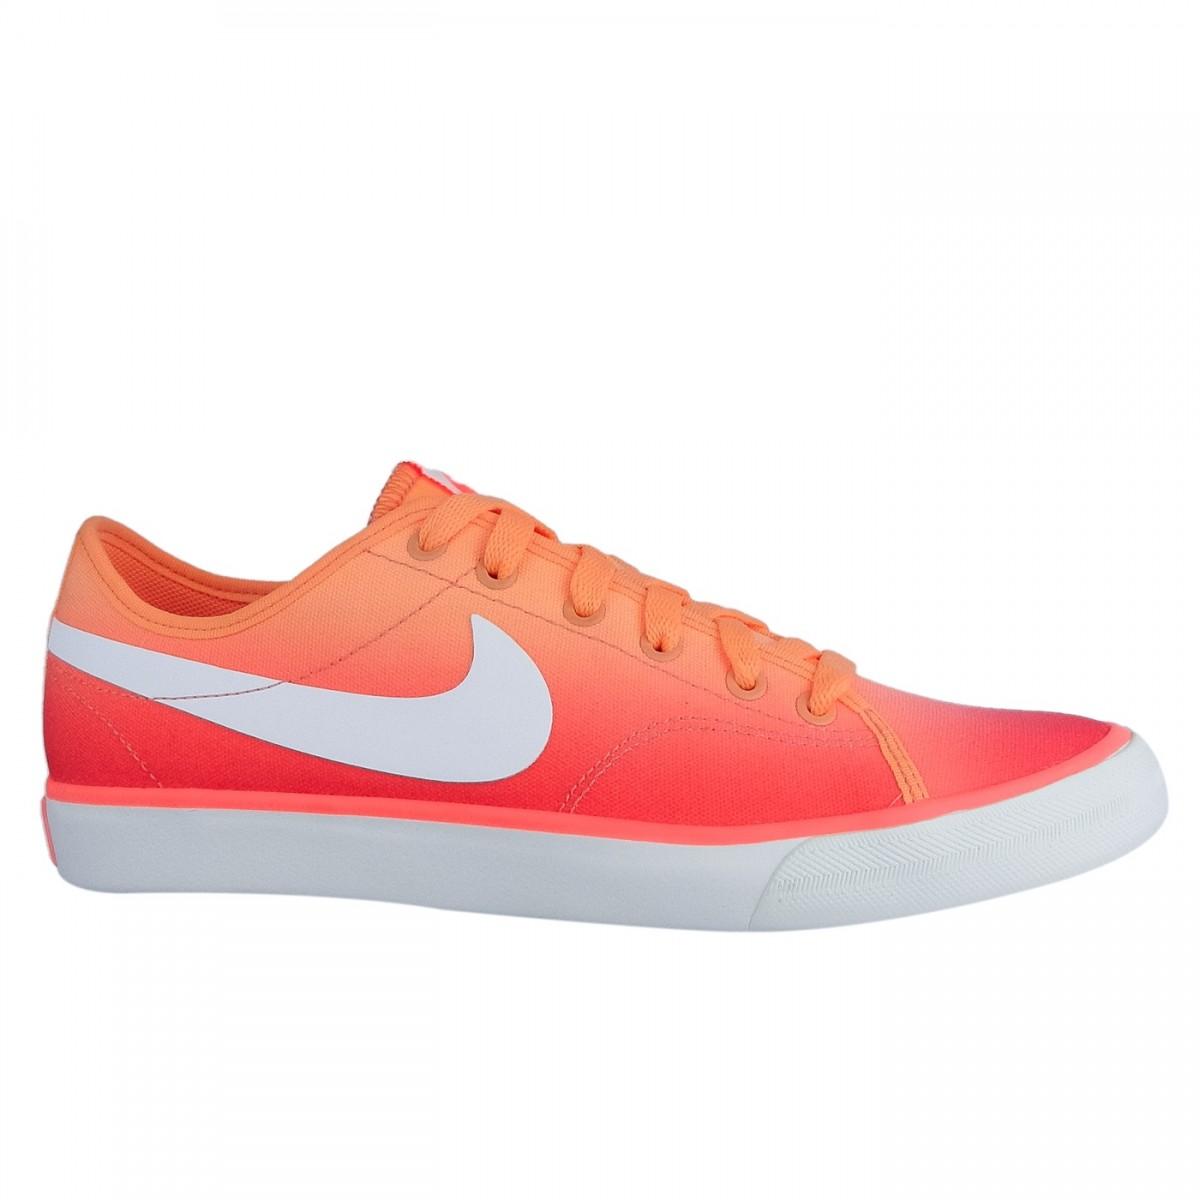 Tênis Feminino Nike Primo Court Canvas Pin 654652-001 - Laranja ... 07aff8f67992f